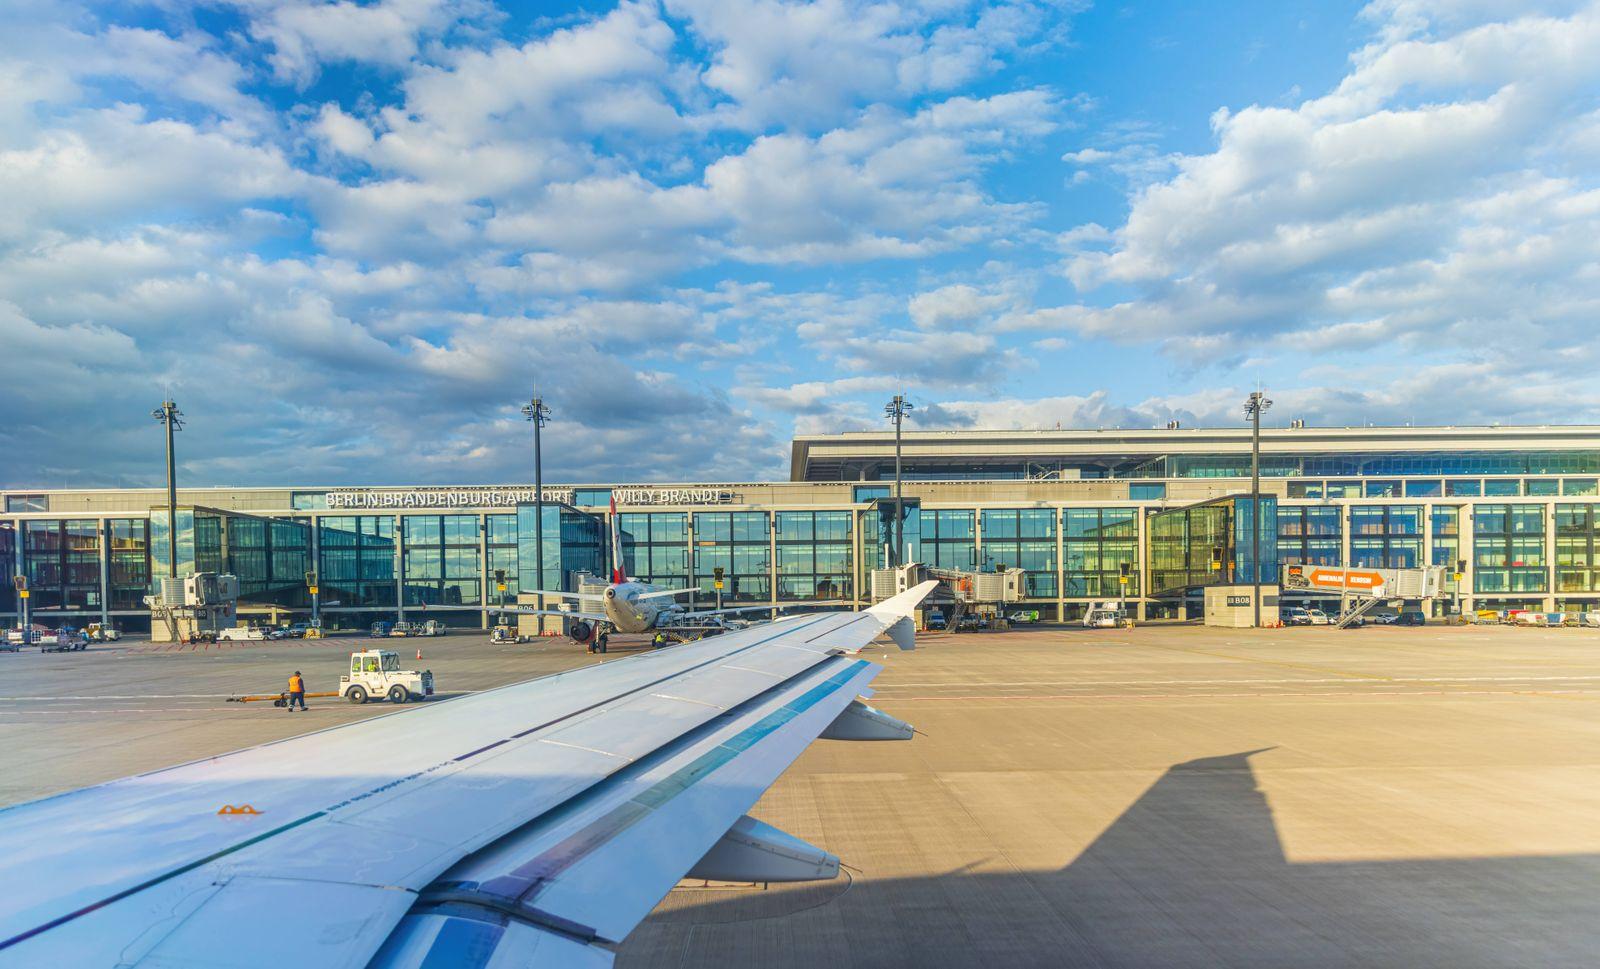 The new Airport Berlin Brandenburg Willy Brandt International Airport SCHOENEFELD, GERMANY - MAY 18, 2021: Exterior view